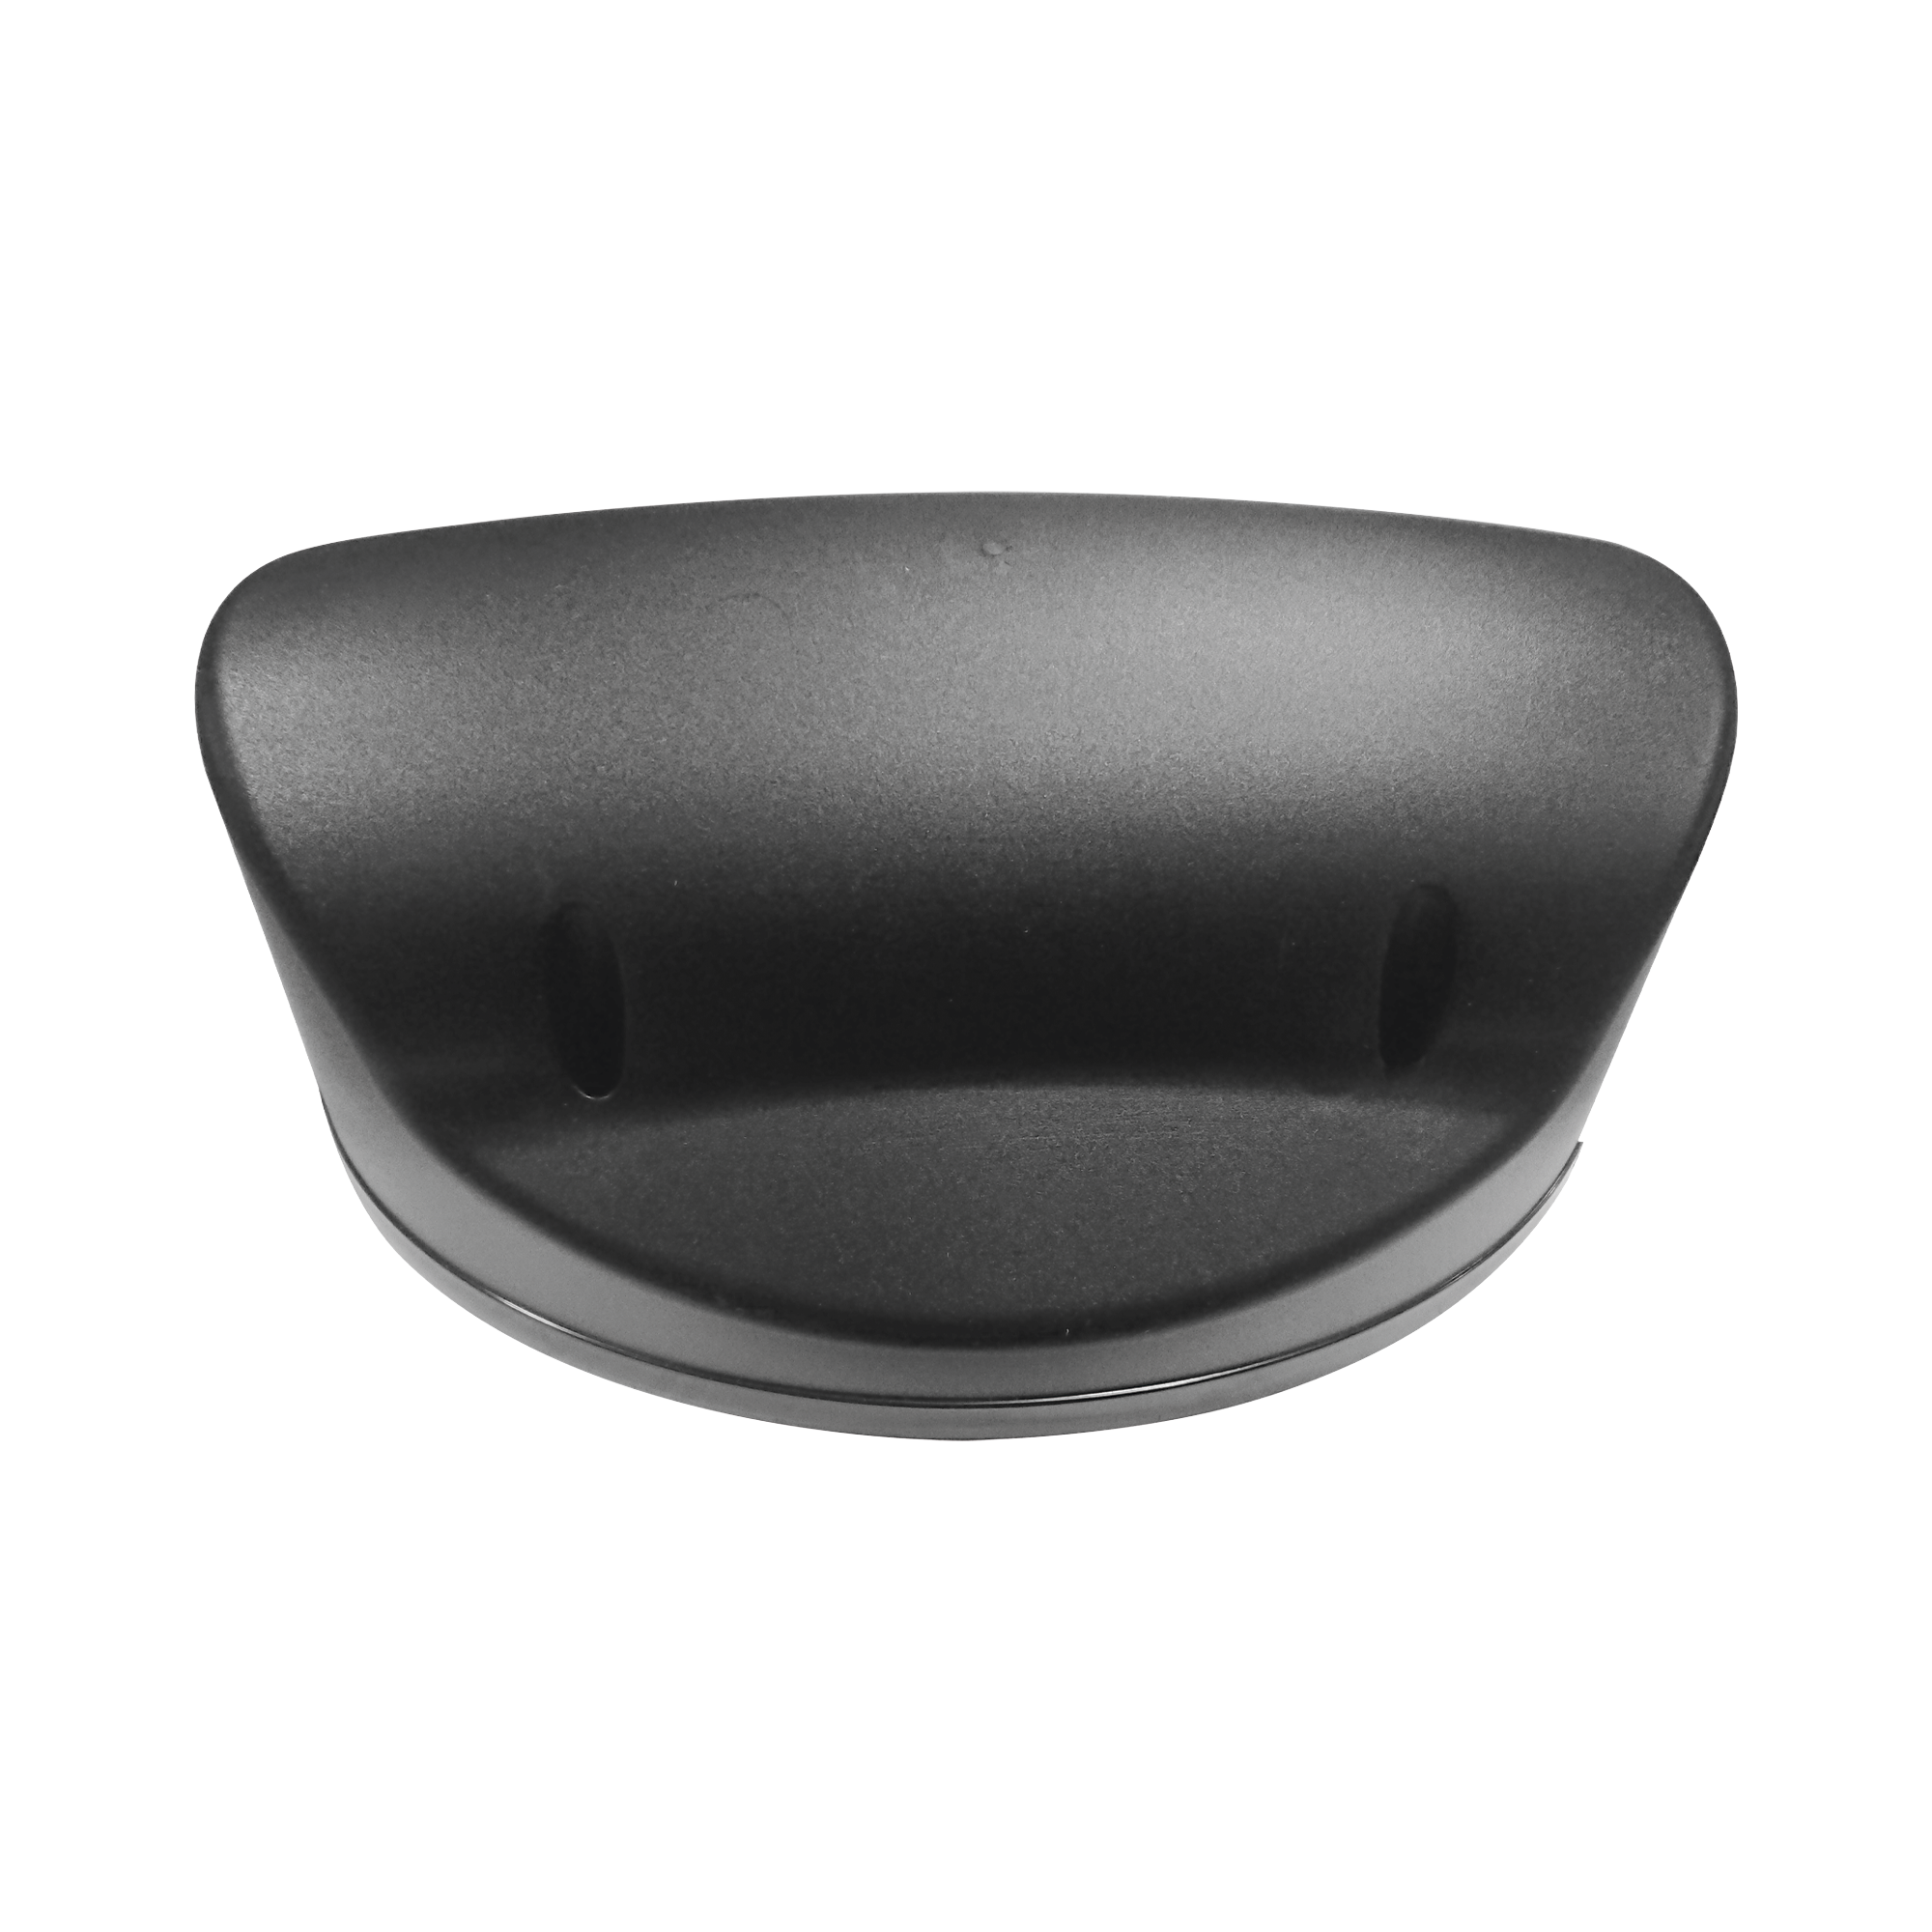 Tapa Plastica para Enganche de Barreras G3750